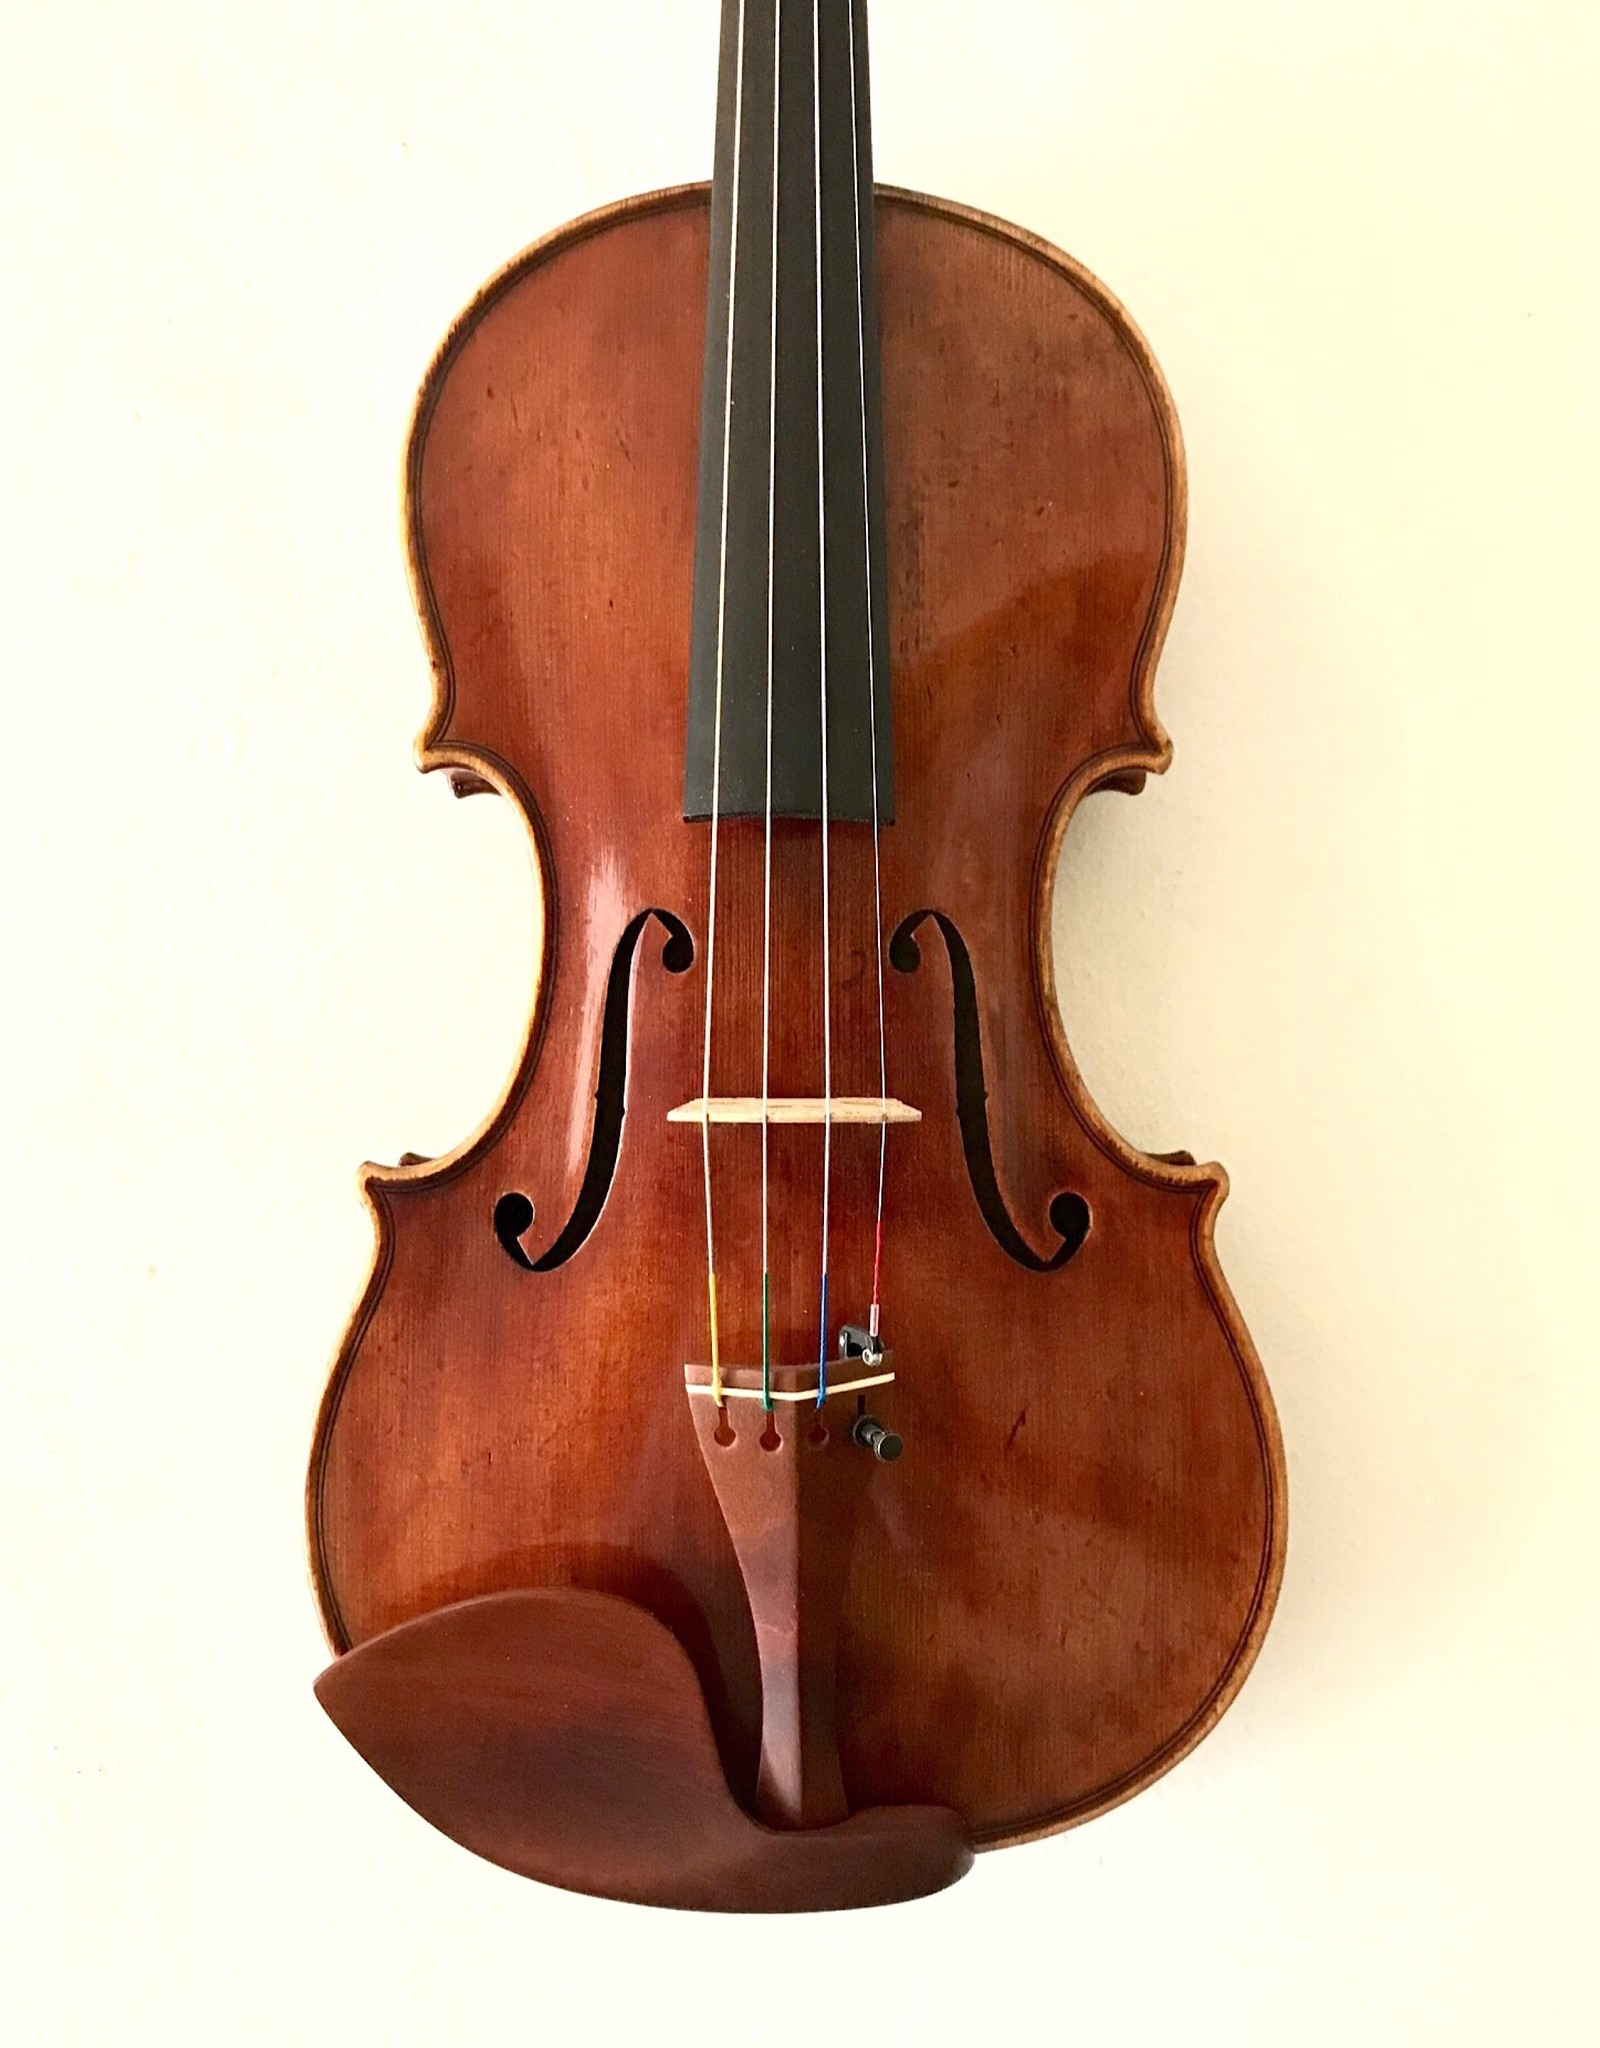 European GIUSEPPE ROSSI 1923 label European violin